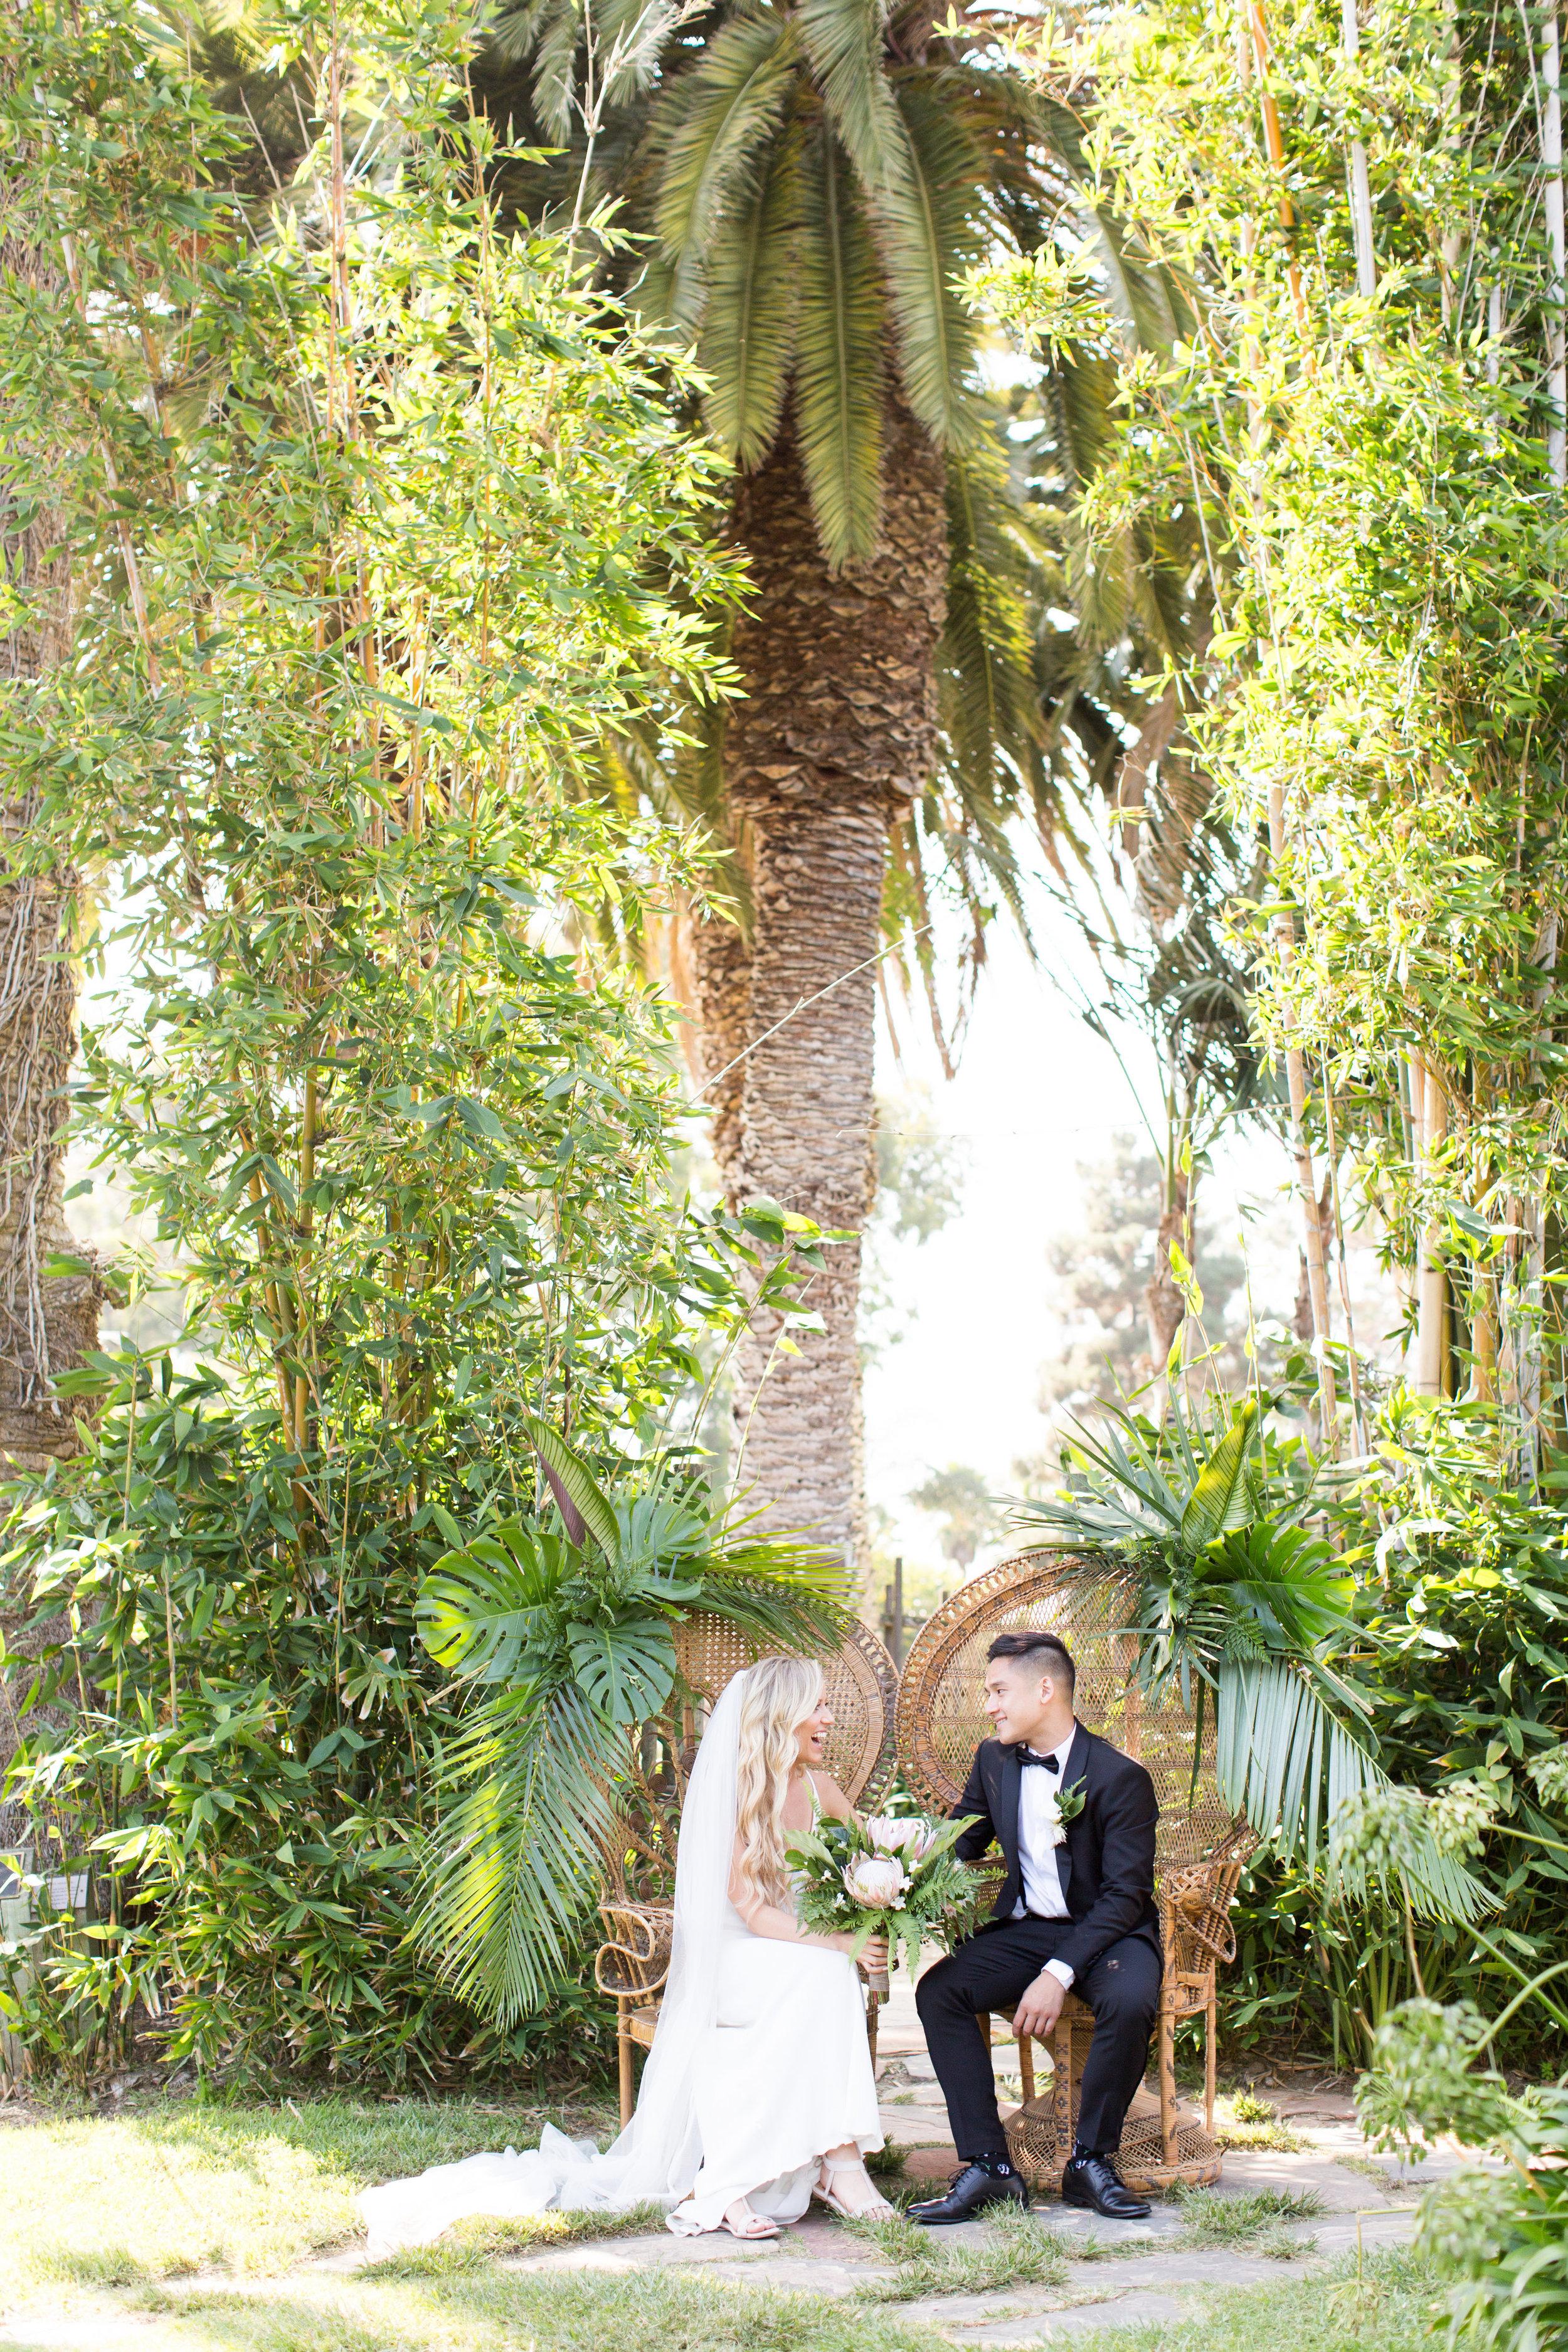 www.santabarbarawedding.com   Santa Barbara Zoo   Wonder Tribe   Events by Rincon   Bride and Groom